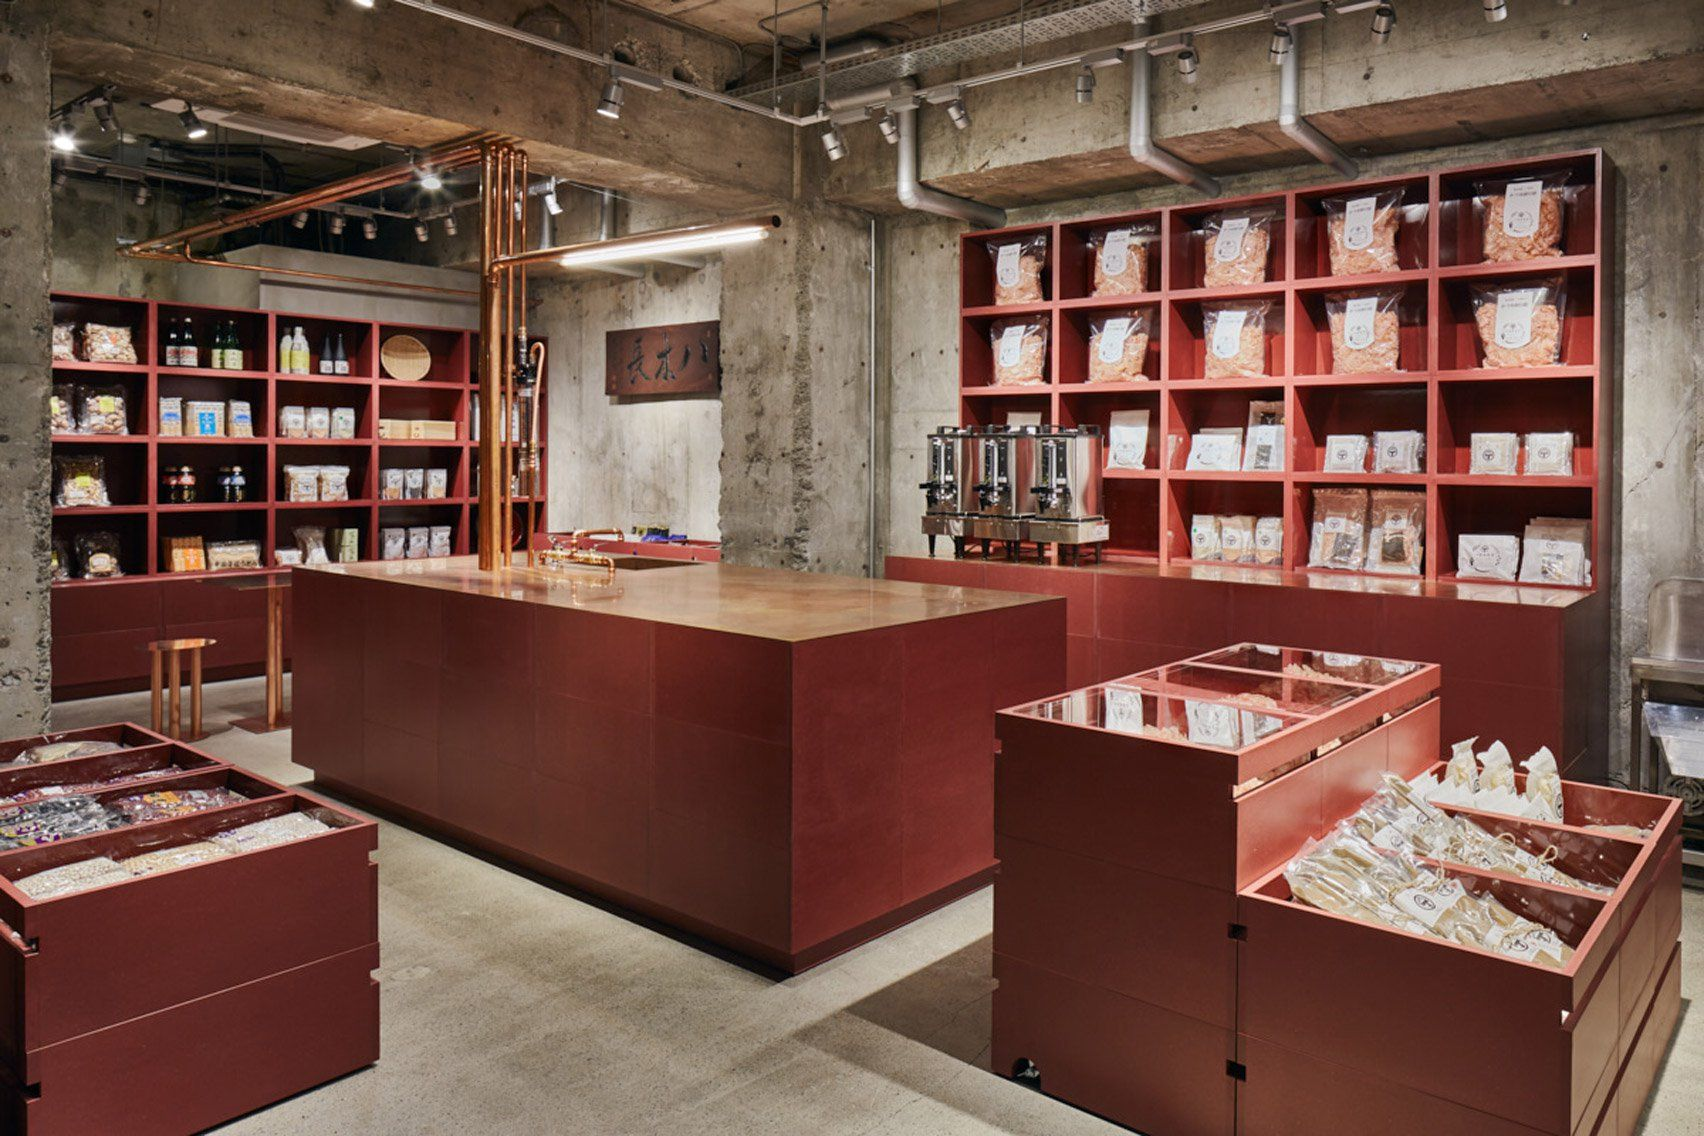 Yagicho Honten Grocery Store By Schemata Architects Minimalist Decor Minimalist Interior Shop Interiors